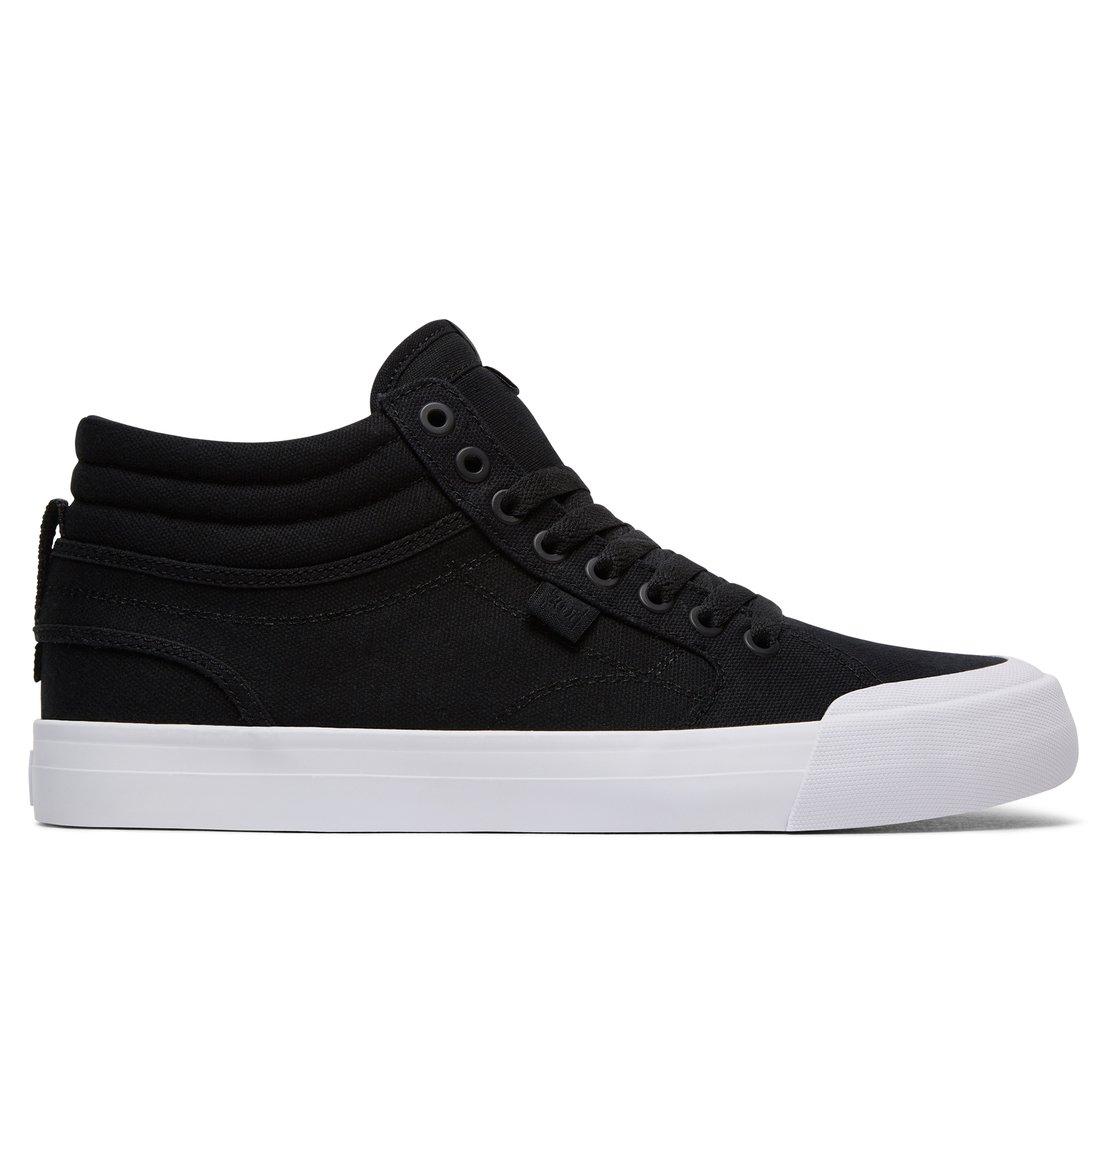 394f7411be DC Shoes™ Men s Evan Smith Hi TX High Top Shoes ADYS300383